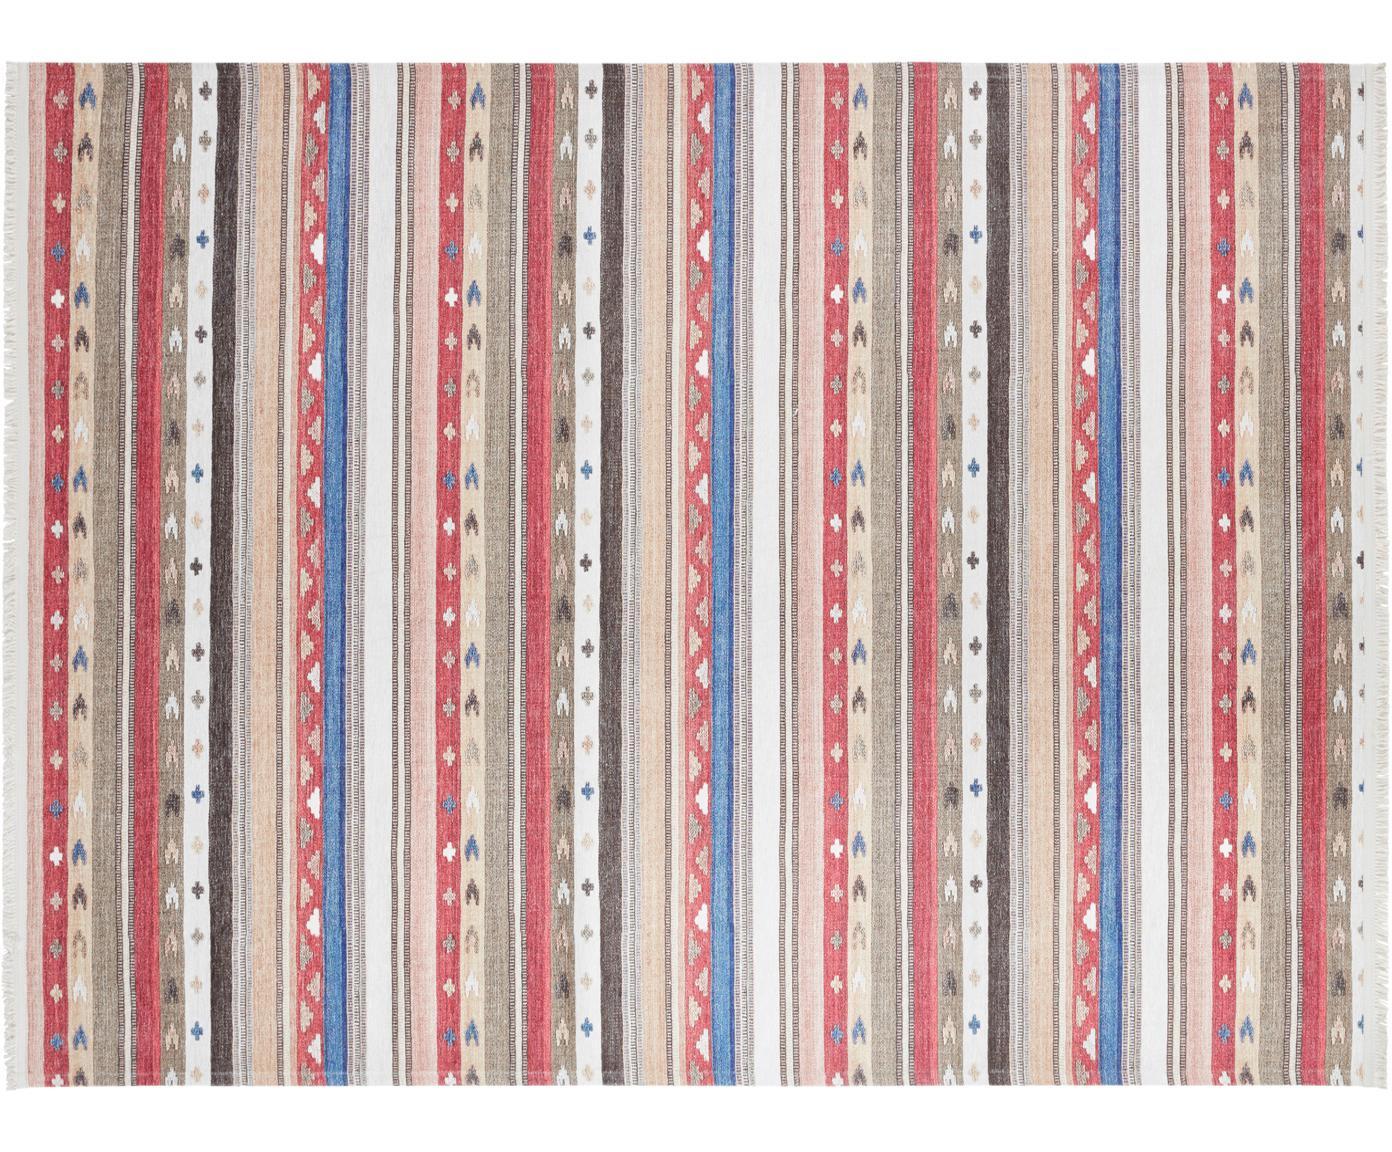 Alfombra kilim Senon, estilo oriental, Parte superior: 50%poliéster, 50%algodó, Reverso: poliéster, Multicolor, An 120 x L 160 cm (Tamaño S)